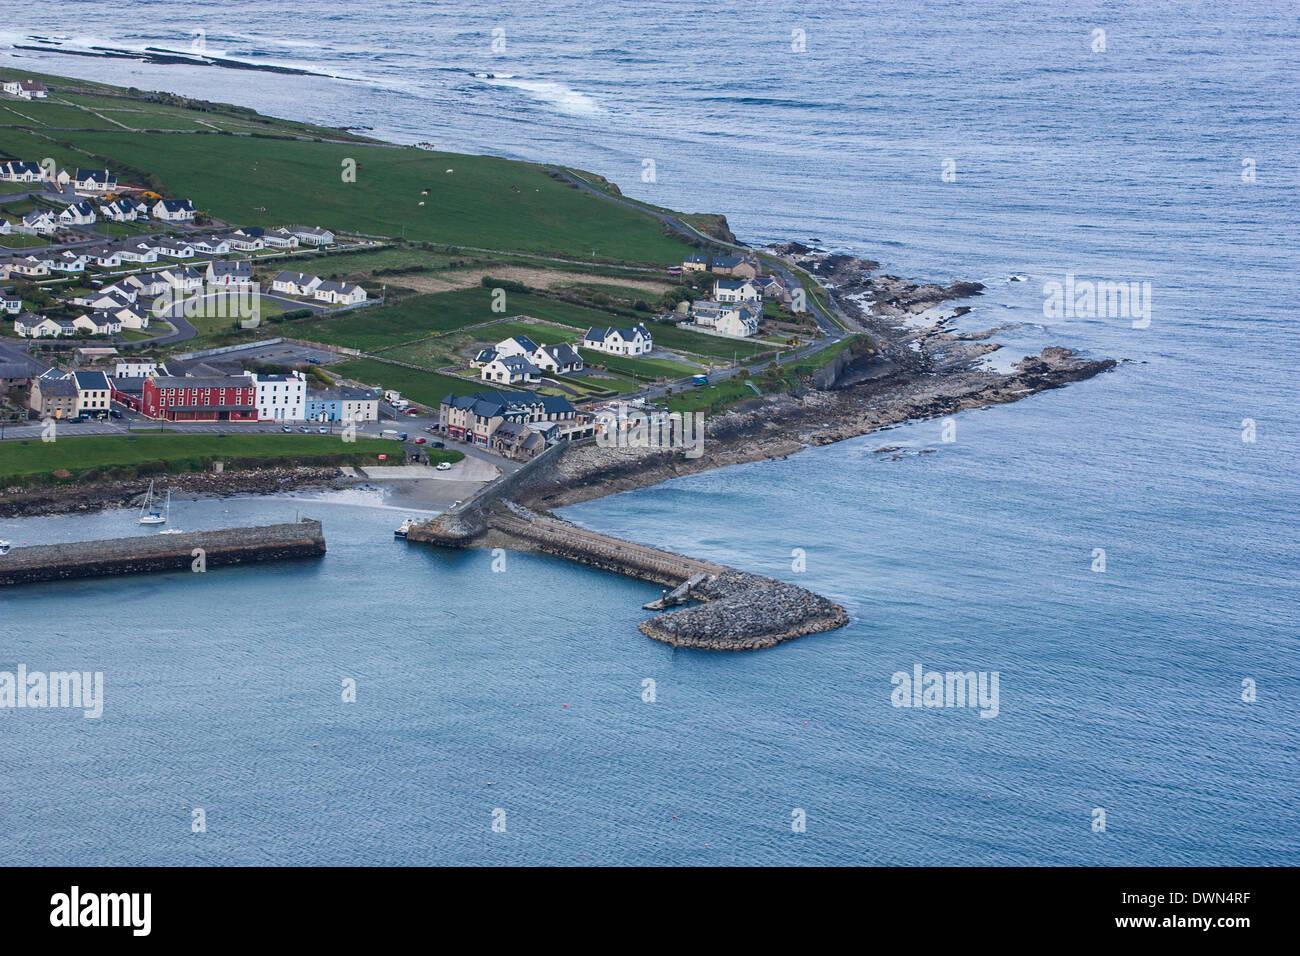 Coney Island, Sligo, Wild Atlantic Way from the air - Stock Image